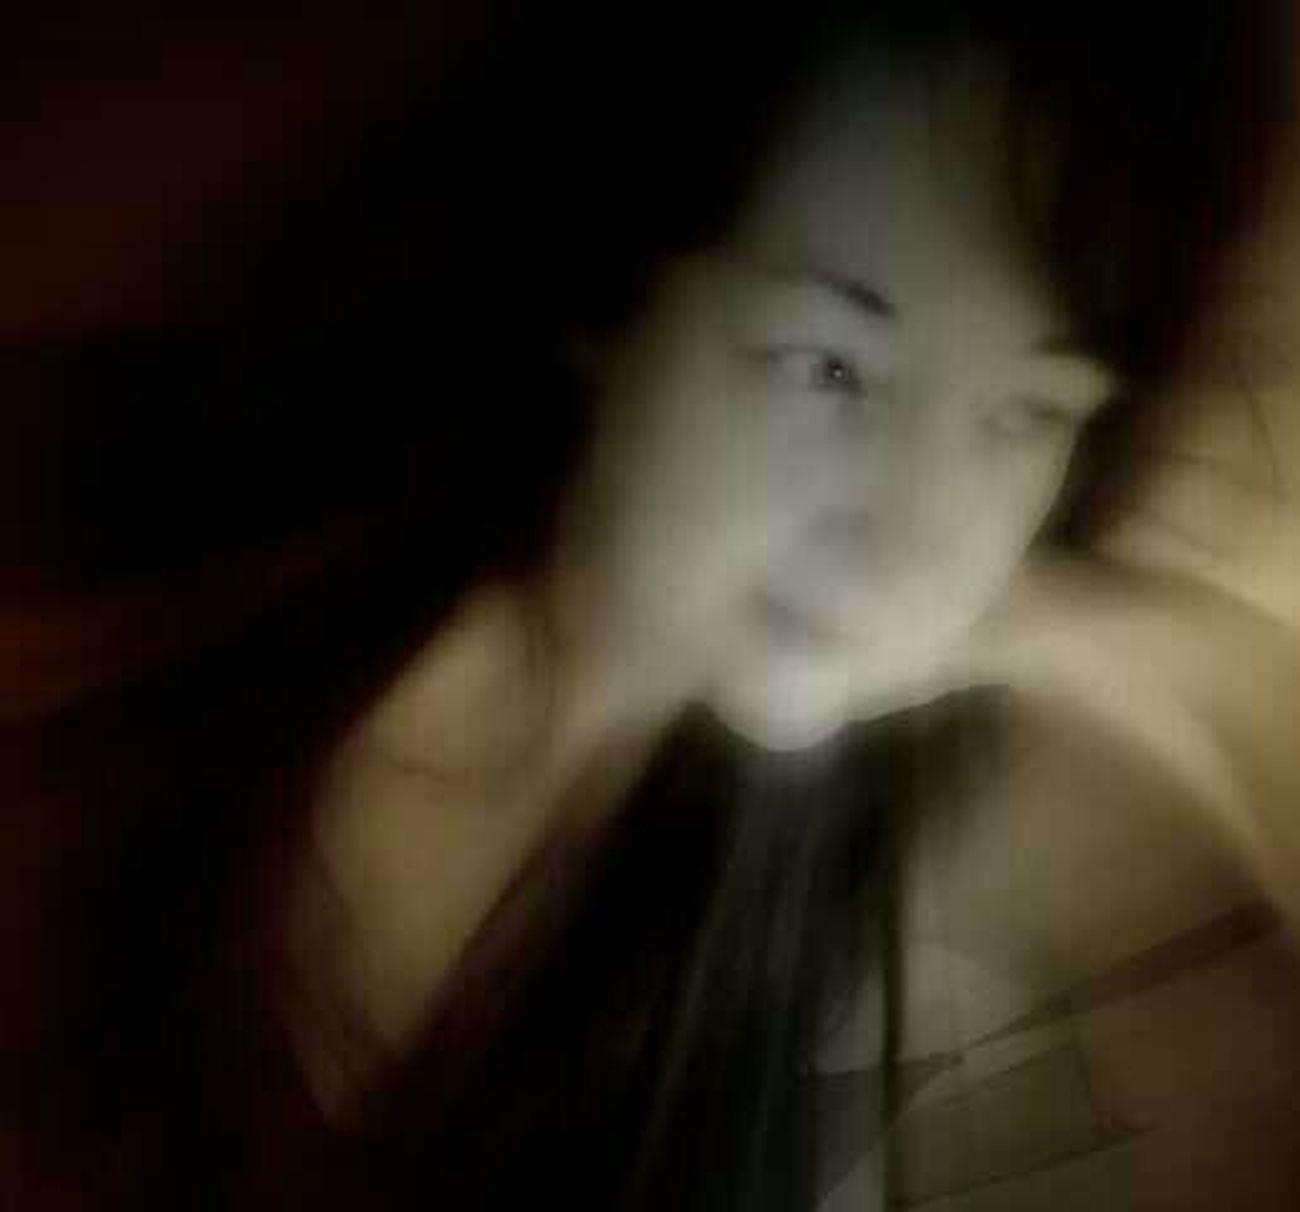 Women Human Face Portrait Of A Woman Beautiful Woman Artistic Photo Portrait Beauty Woman Of EyeEm Self Portrait Edited My Way Selfie ✌ Model - Object Woman Vintage Photo Beautiful People